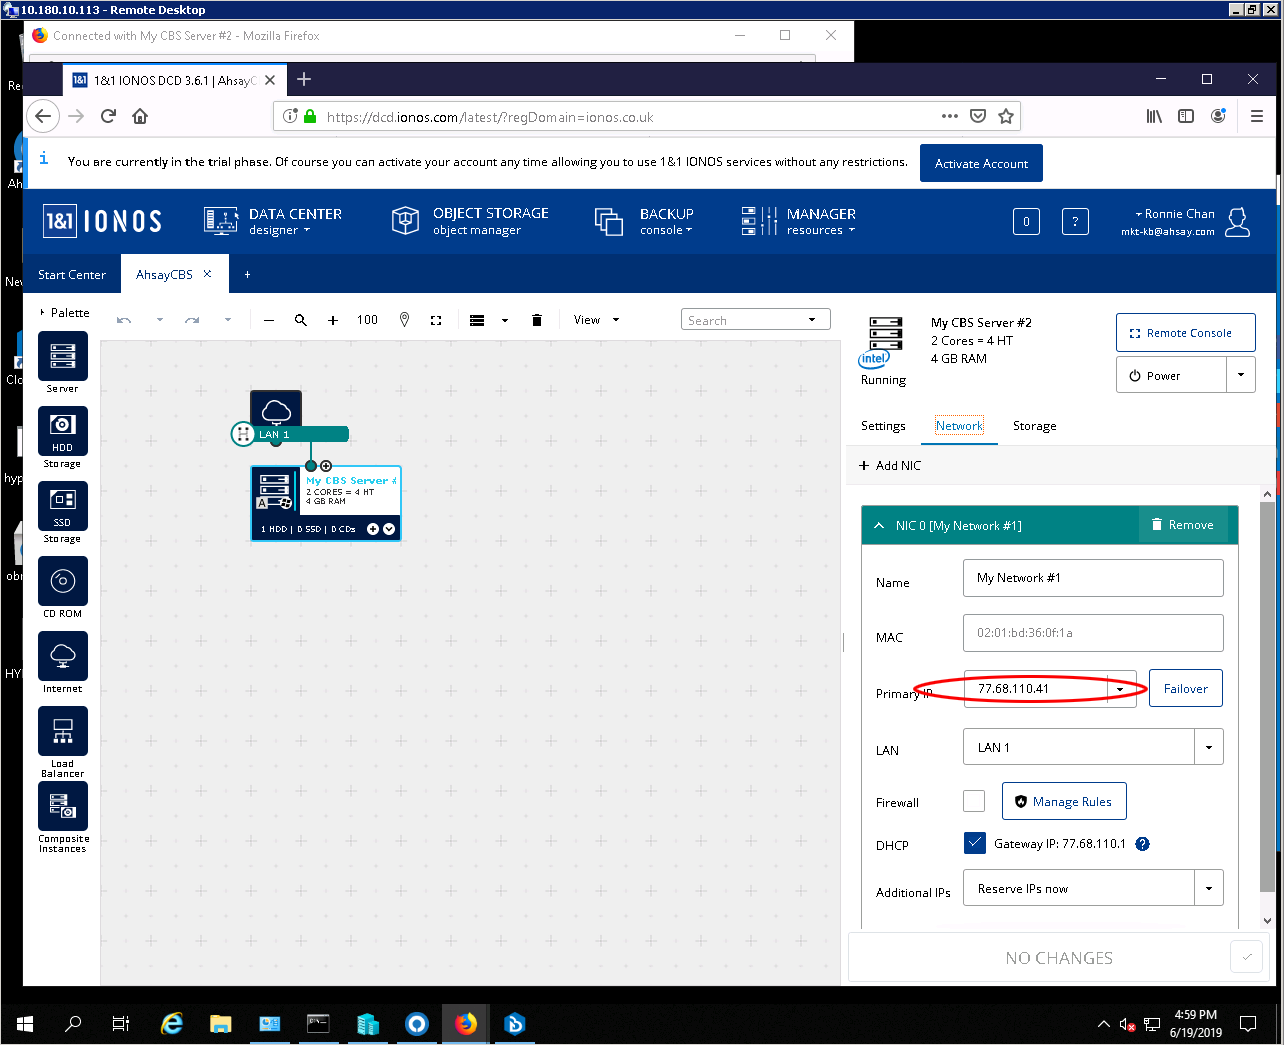 Synology Destination Folder Access Denied